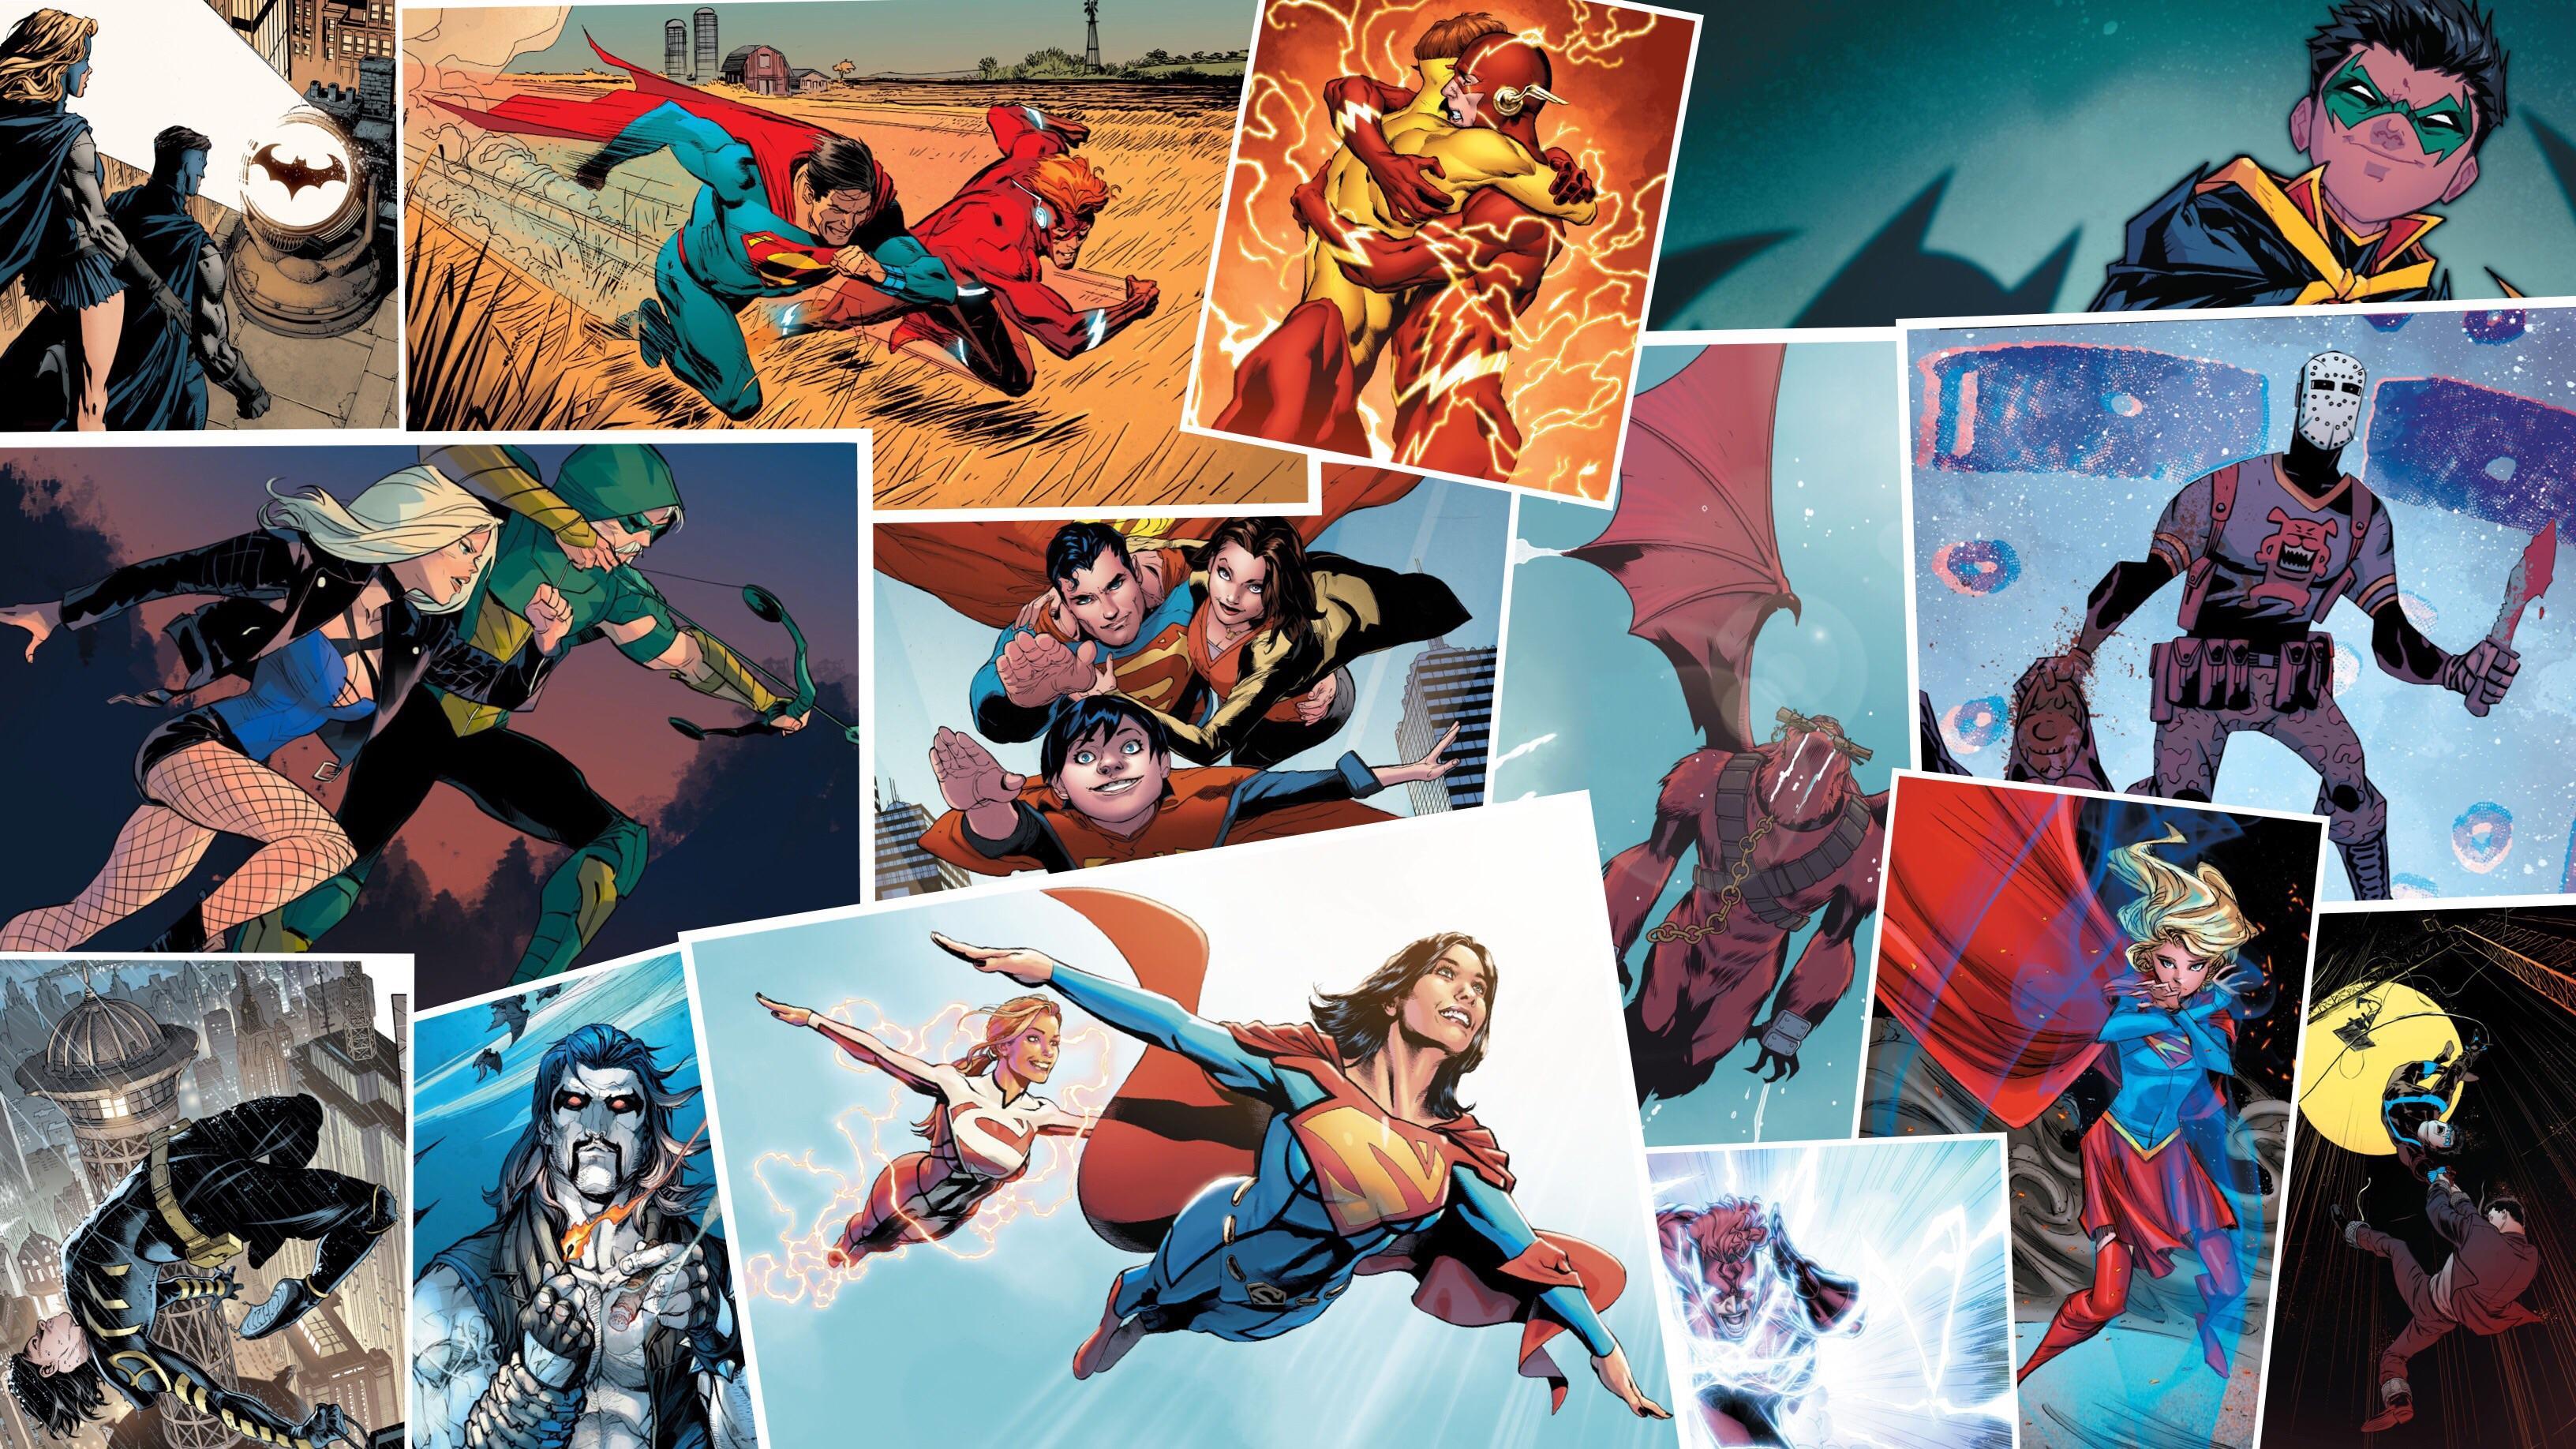 Fan Art] DC Rebirth Desktop Wallpaper IDK artist sorry DCcomics 3264x1836